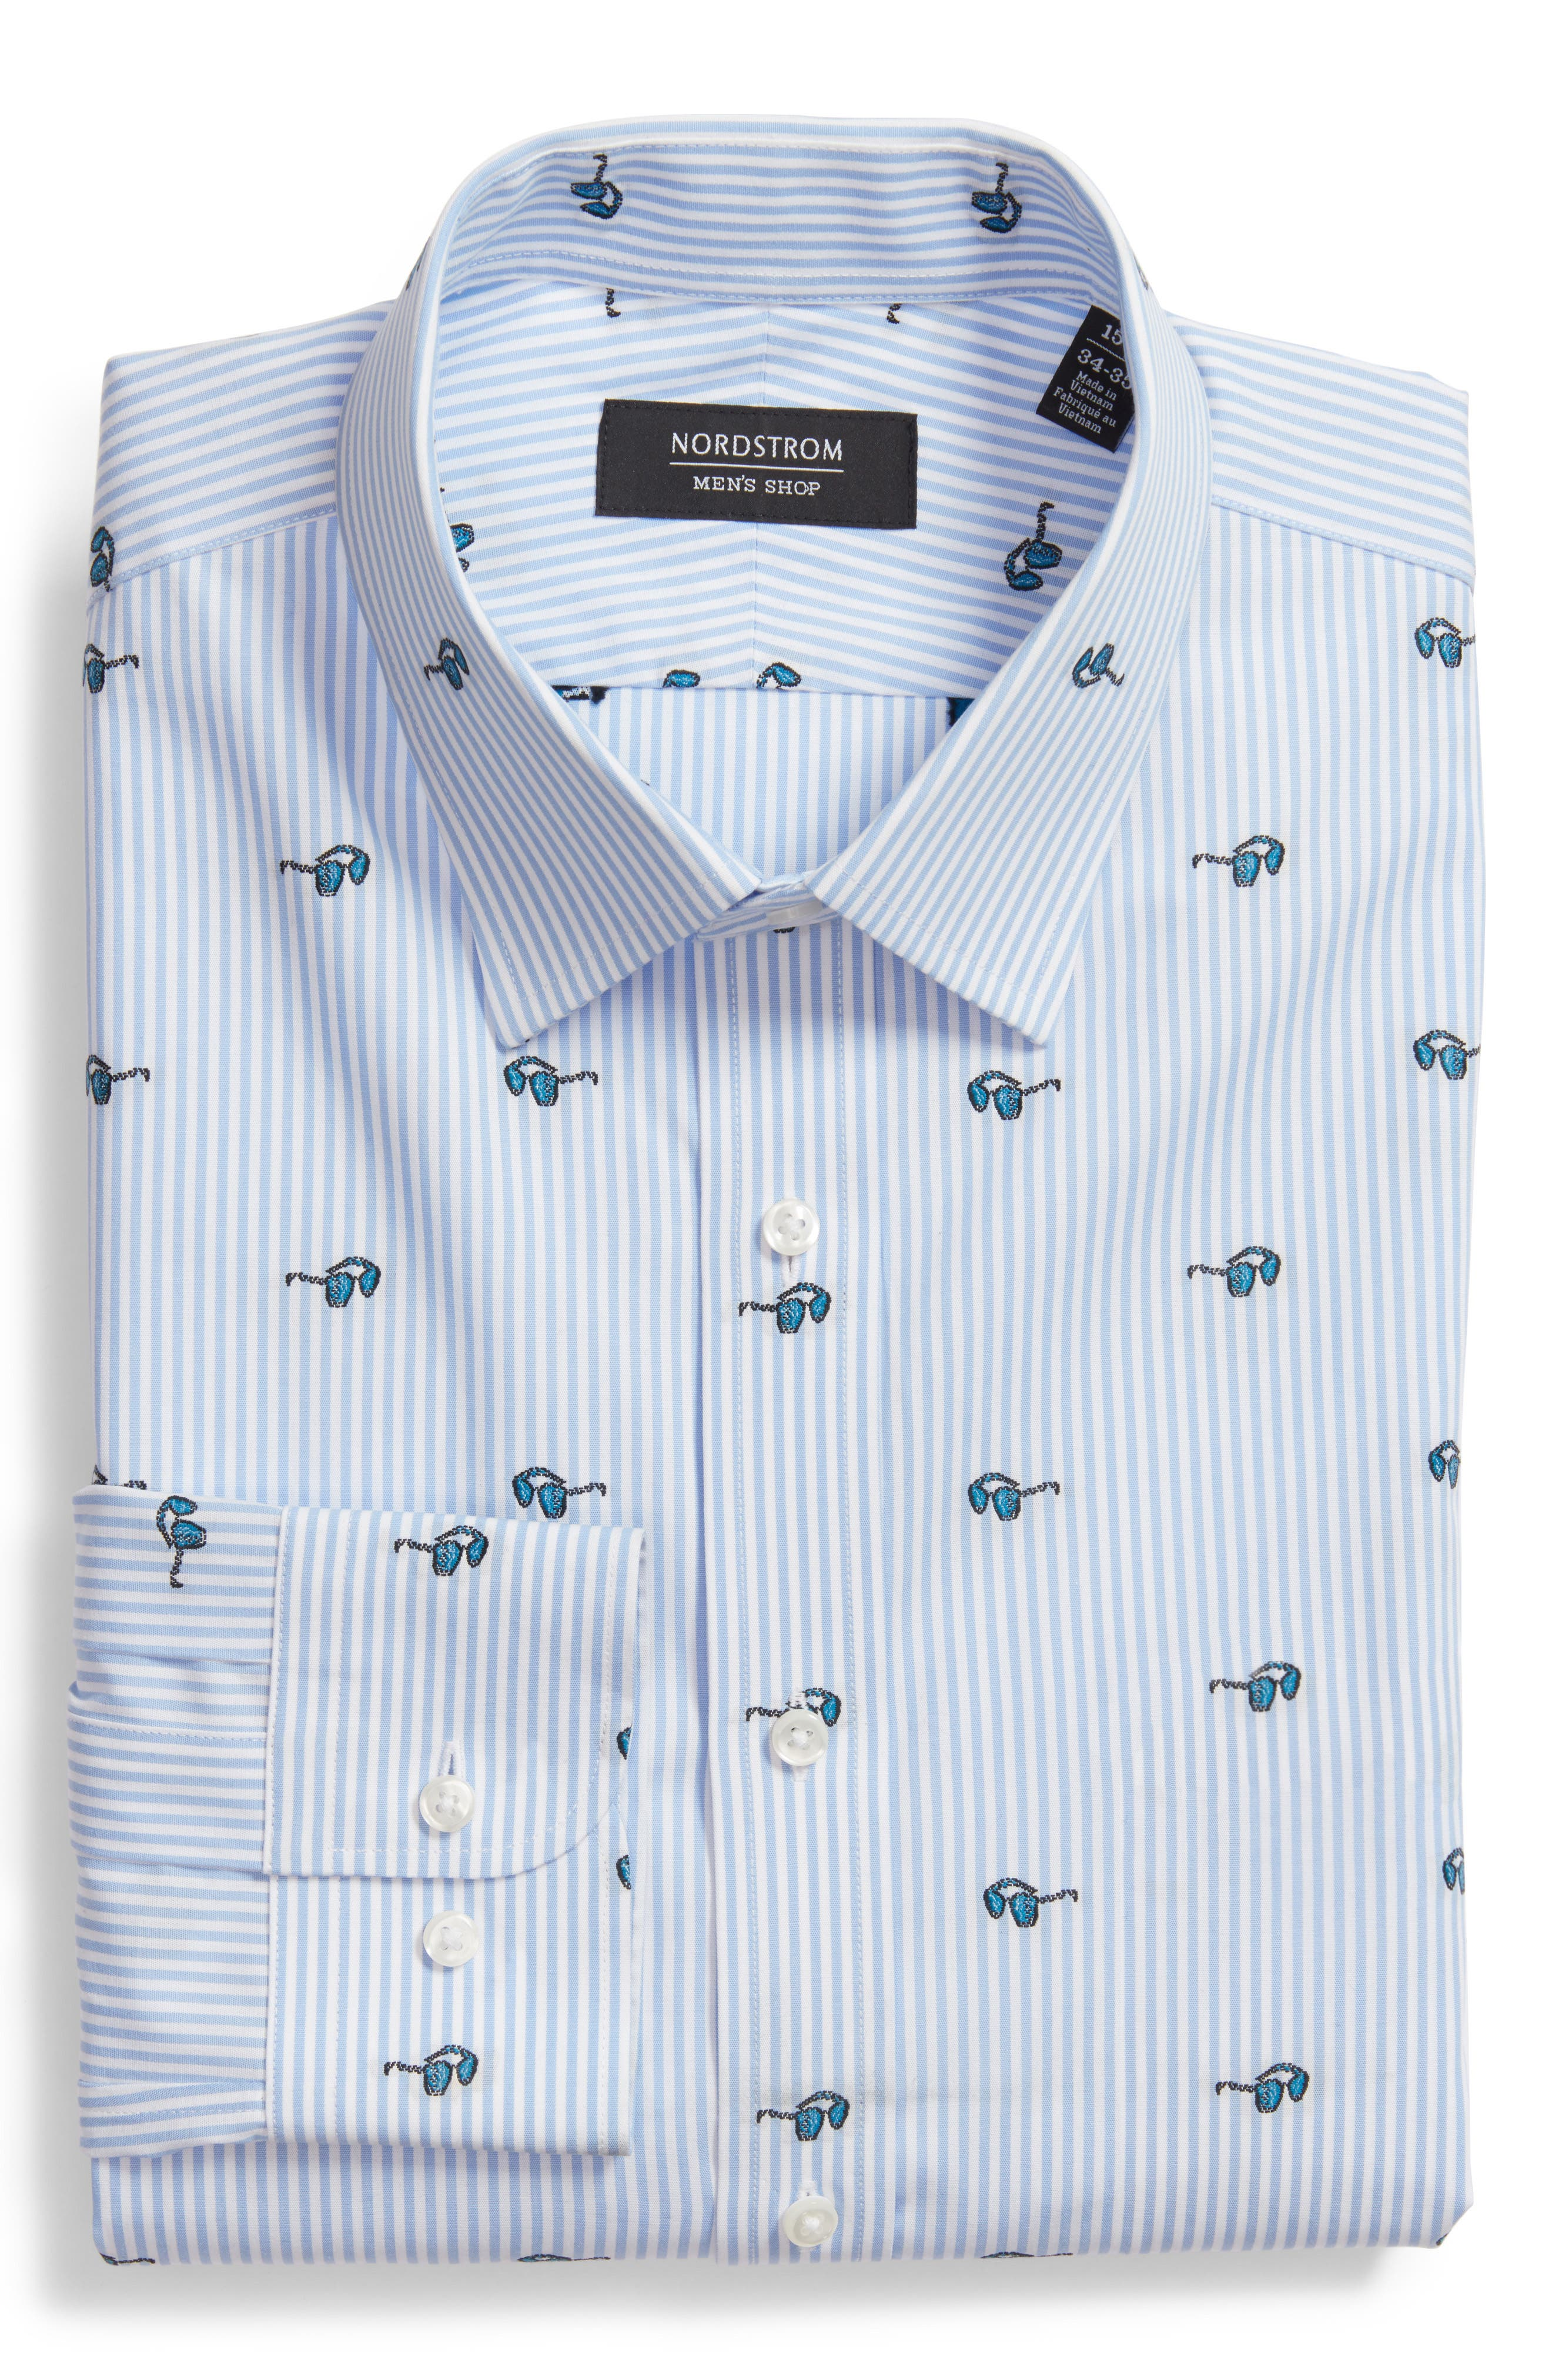 Nordstrom Men's Shop Trim Fit Sunglasses Print Dress Shirt